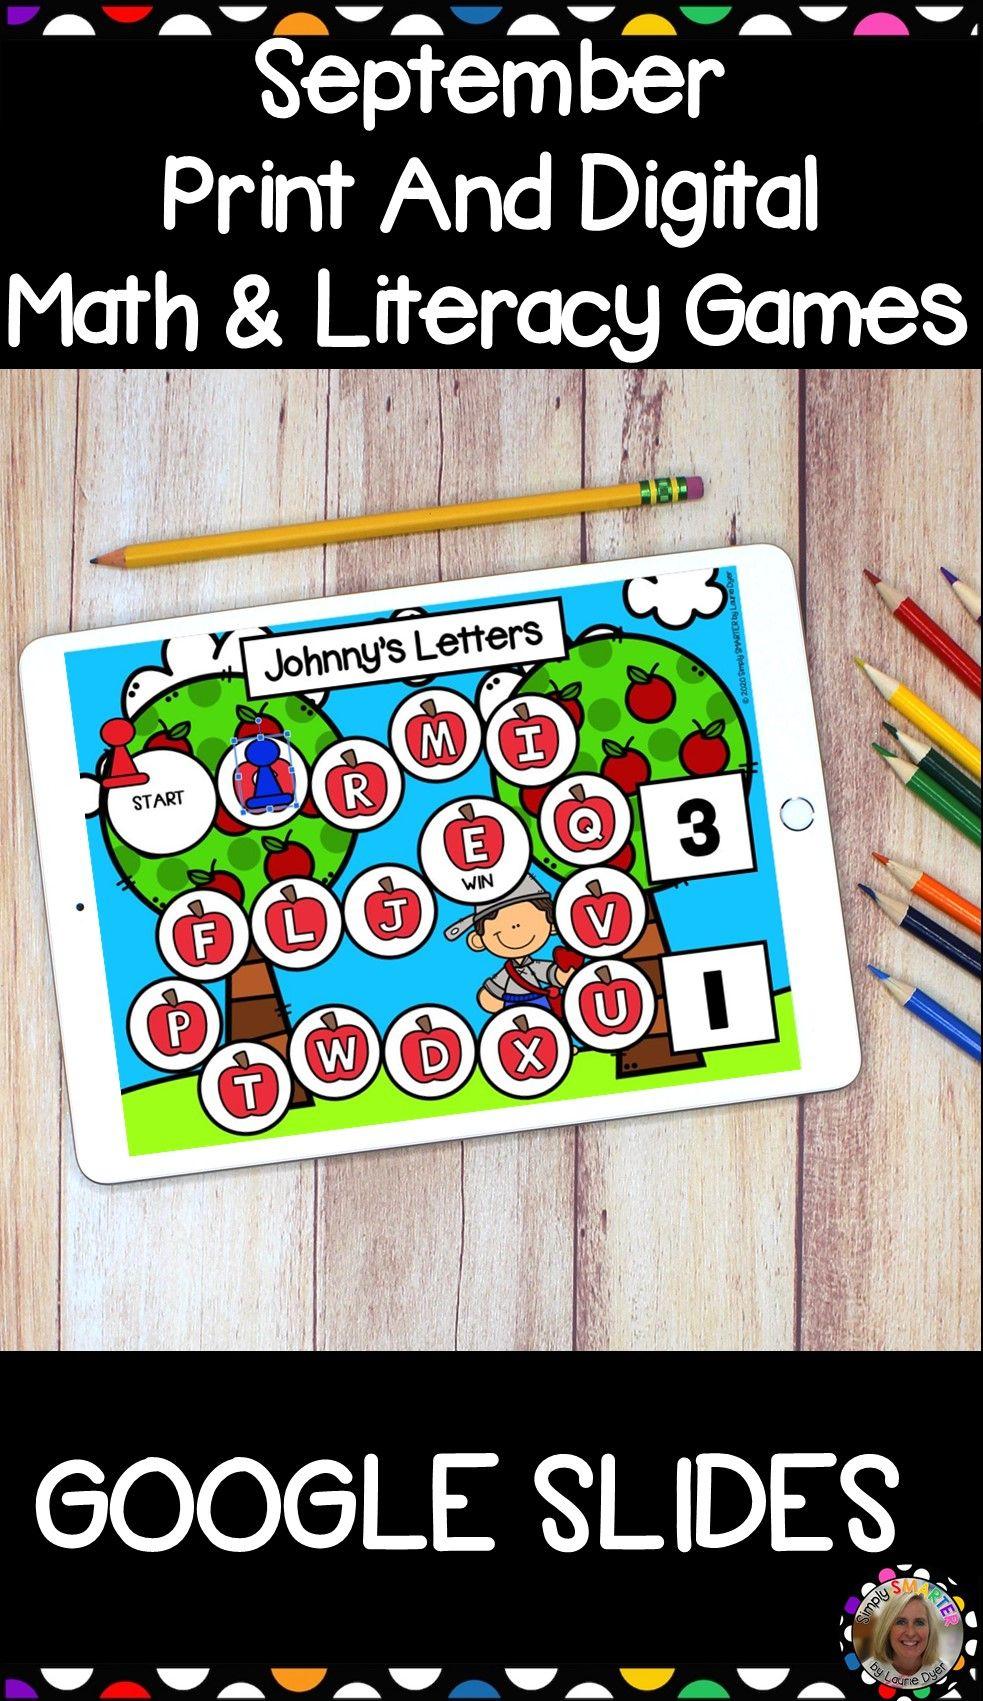 September Math And Literacy Print And Digital Games For Google Slides Math Math Facts Tpt Math [ 1701 x 983 Pixel ]